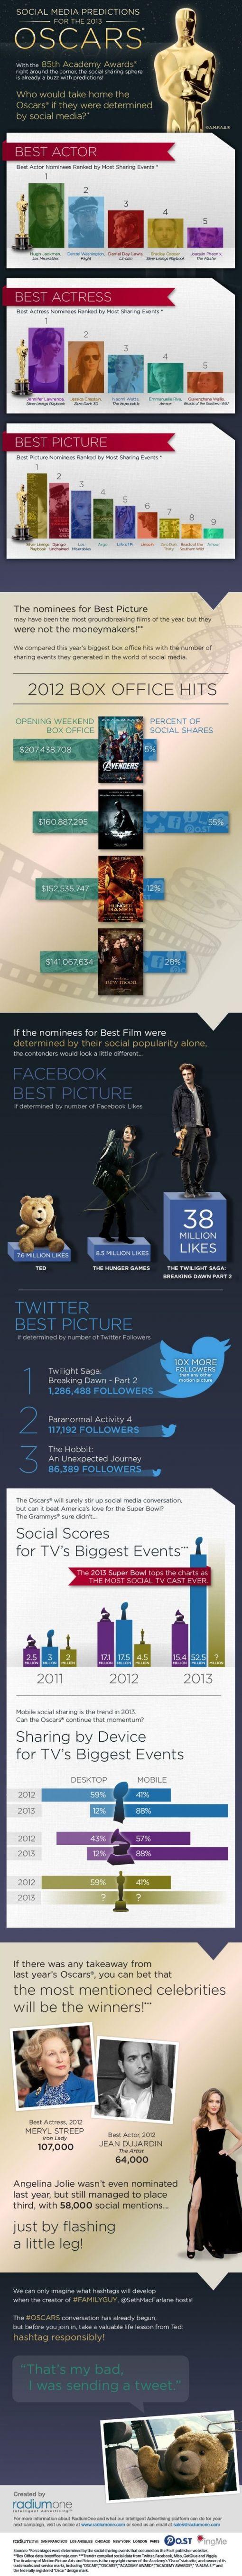 social-media-oscars